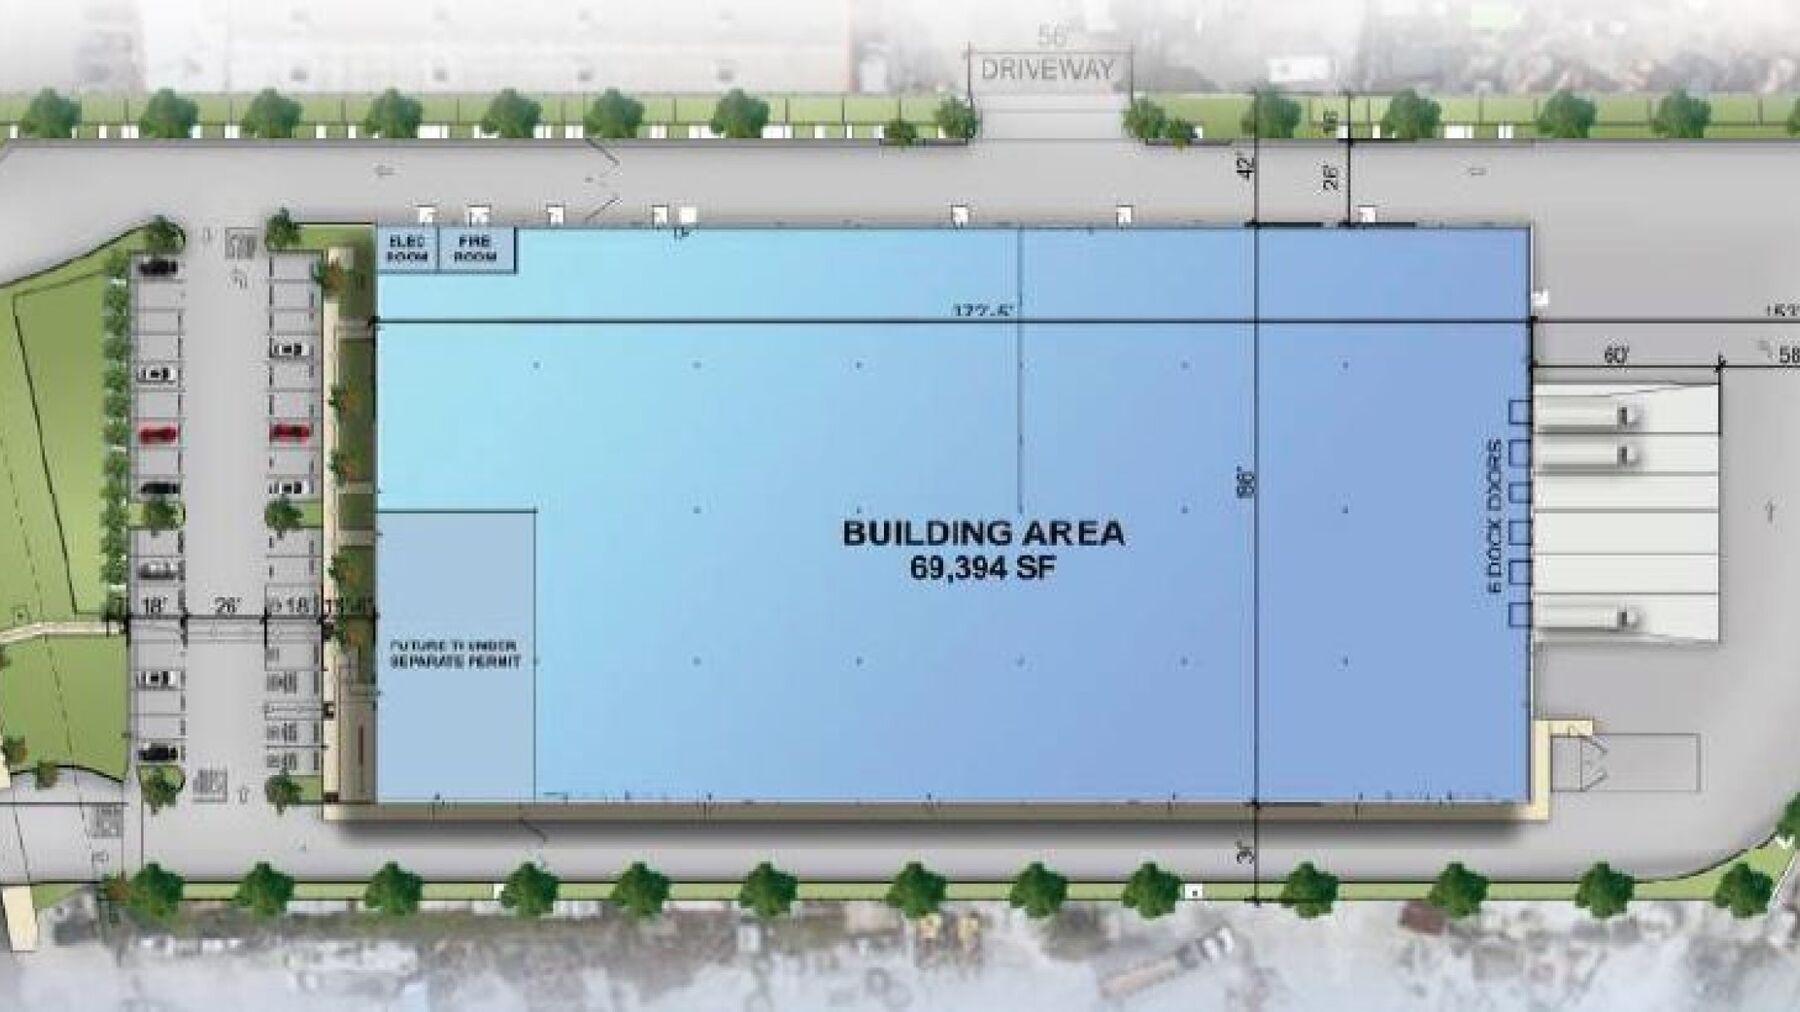 DPM-1420-Old-Bayshore-Hwy-North-San-Jose-46-g-iig158-Warehouse-Site-Plan.jpg